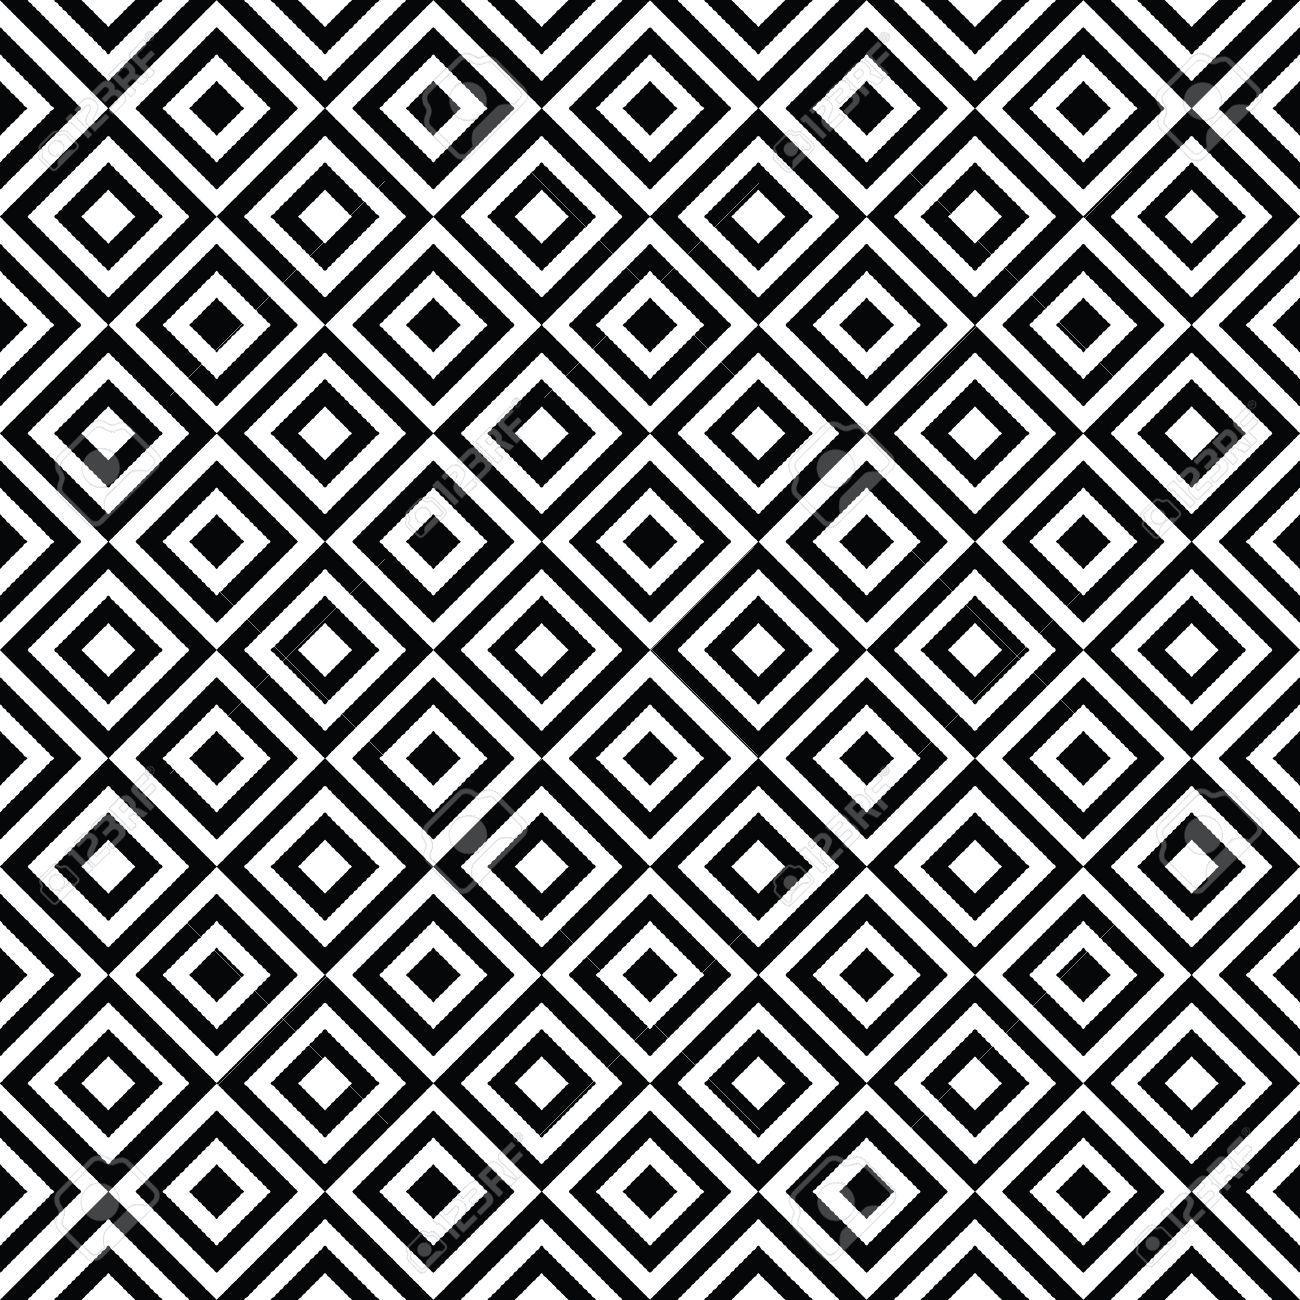 Seamless art deco pattern texture background wallpaper seamless art deco pattern texture background wallpaper 33314833 voltagebd Images